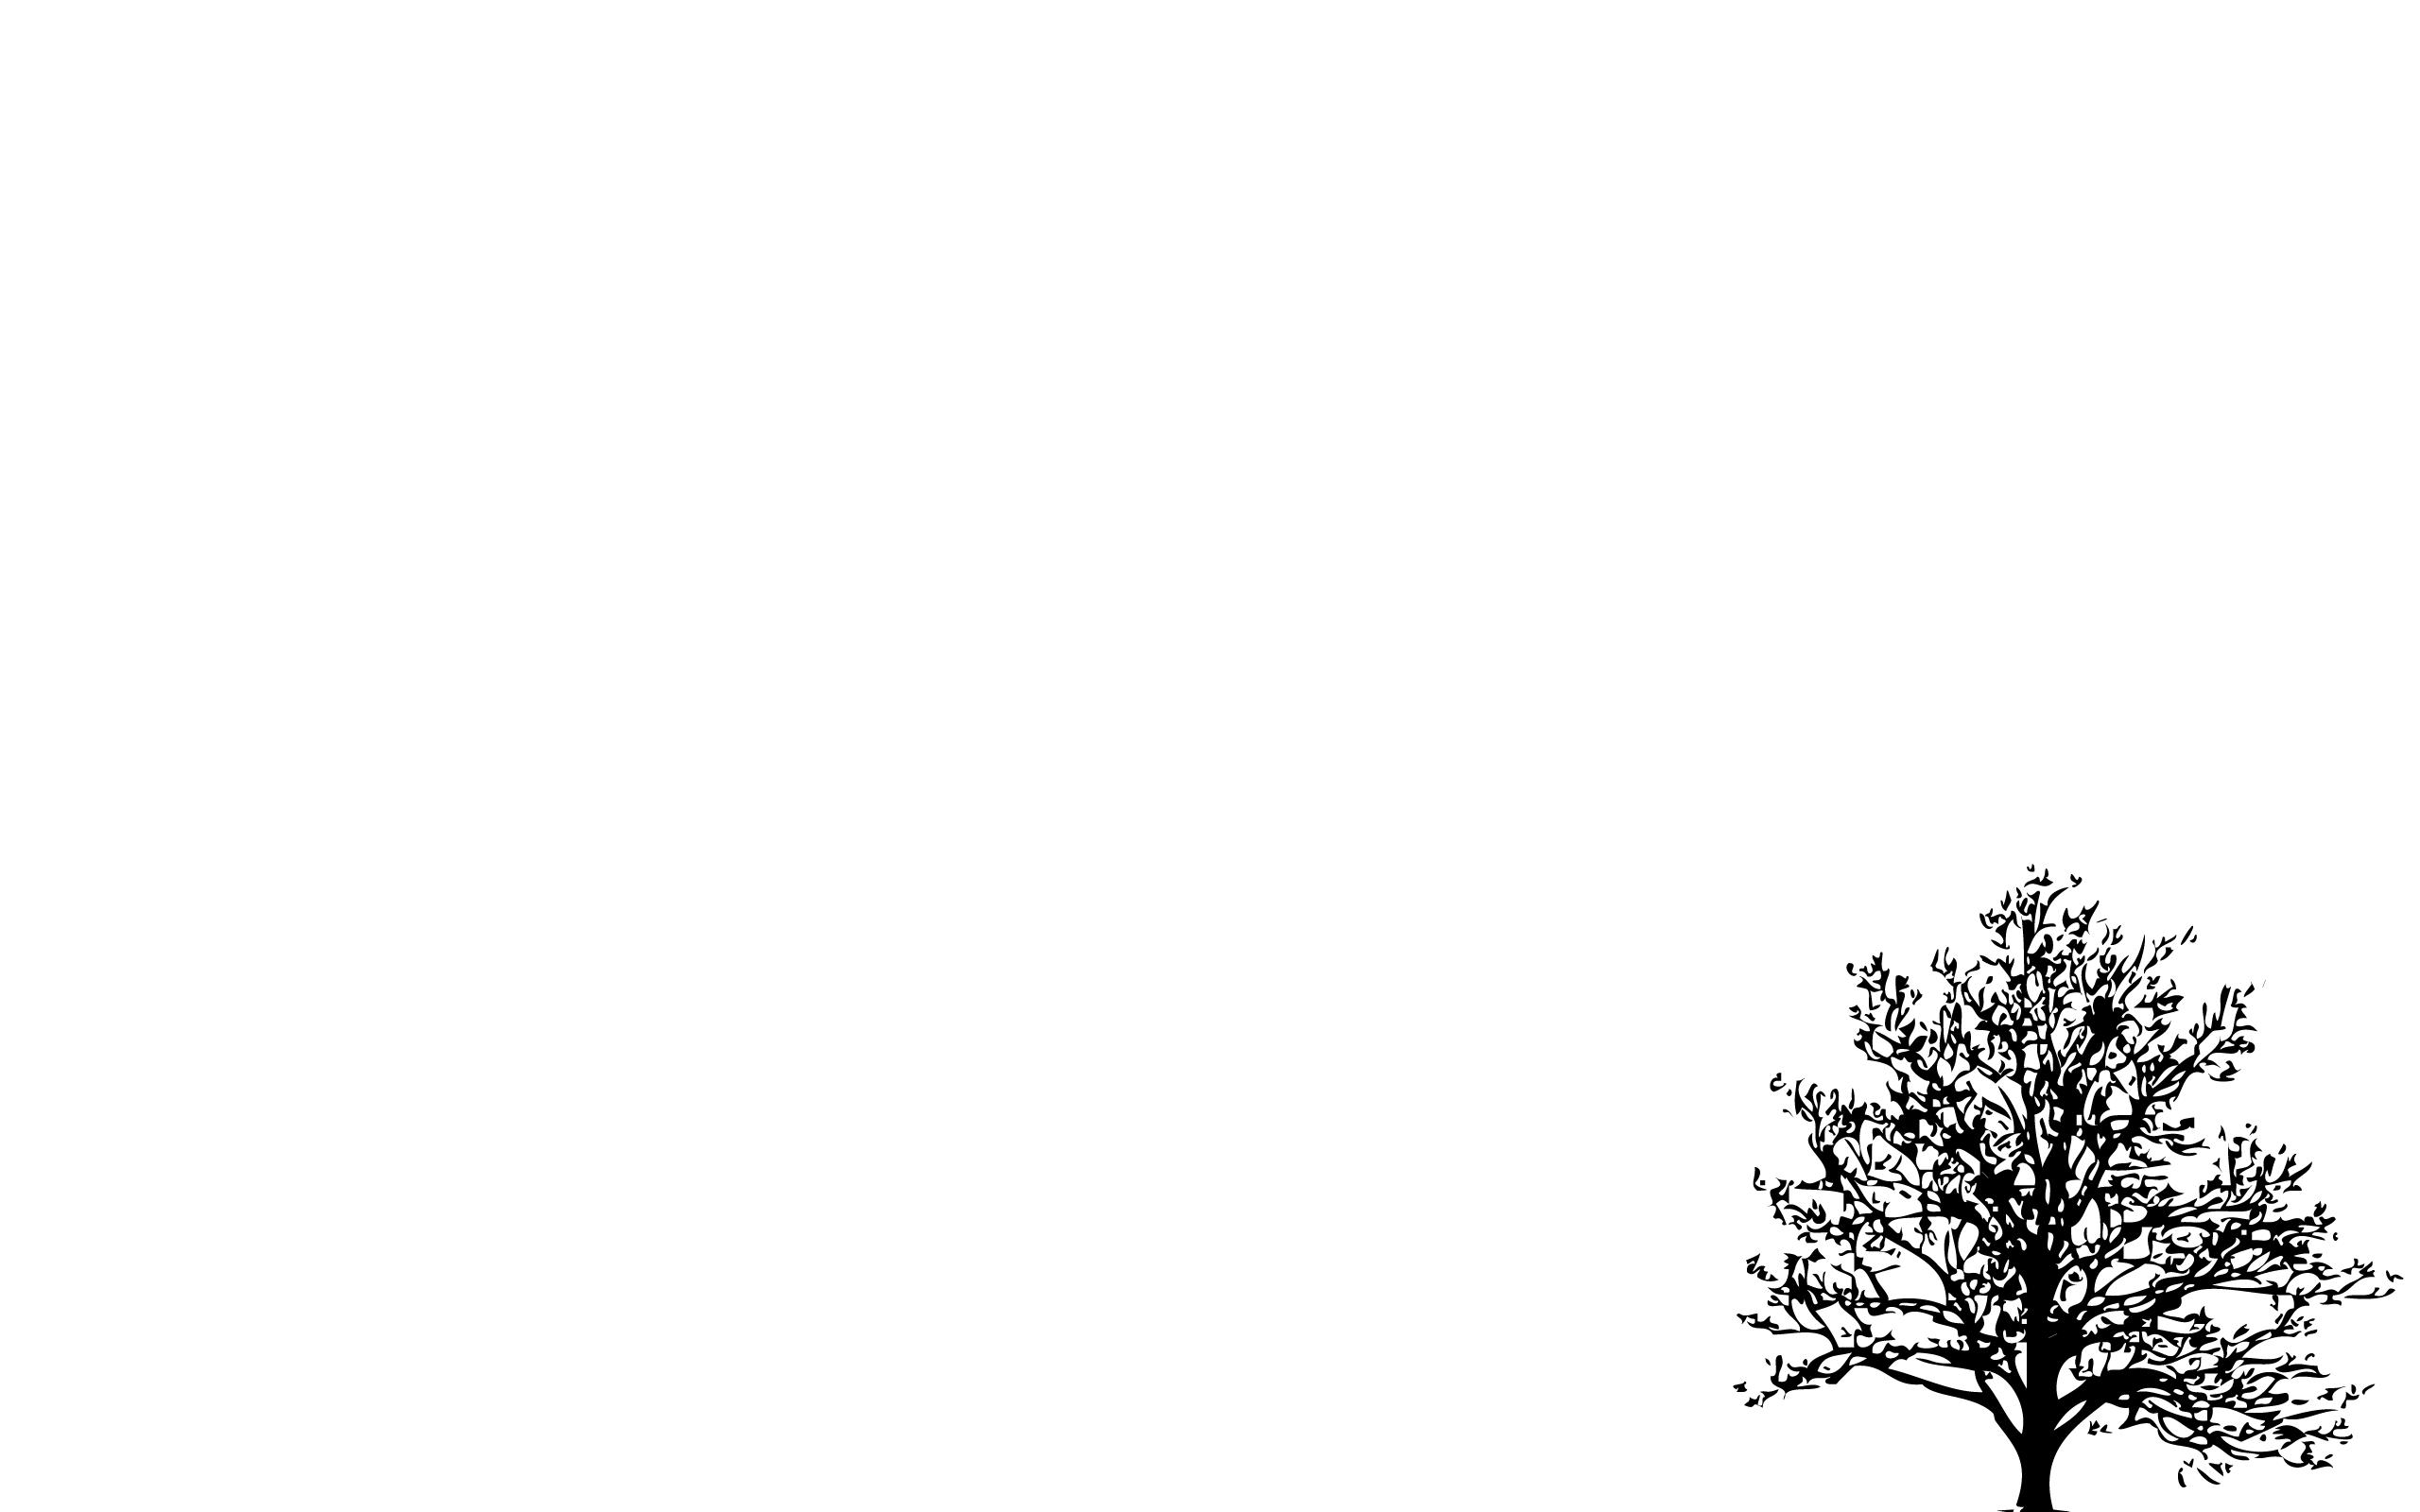 404 Not Found White Background Wallpaper Minimalist Wallpaper Minimalist Desktop Wallpaper